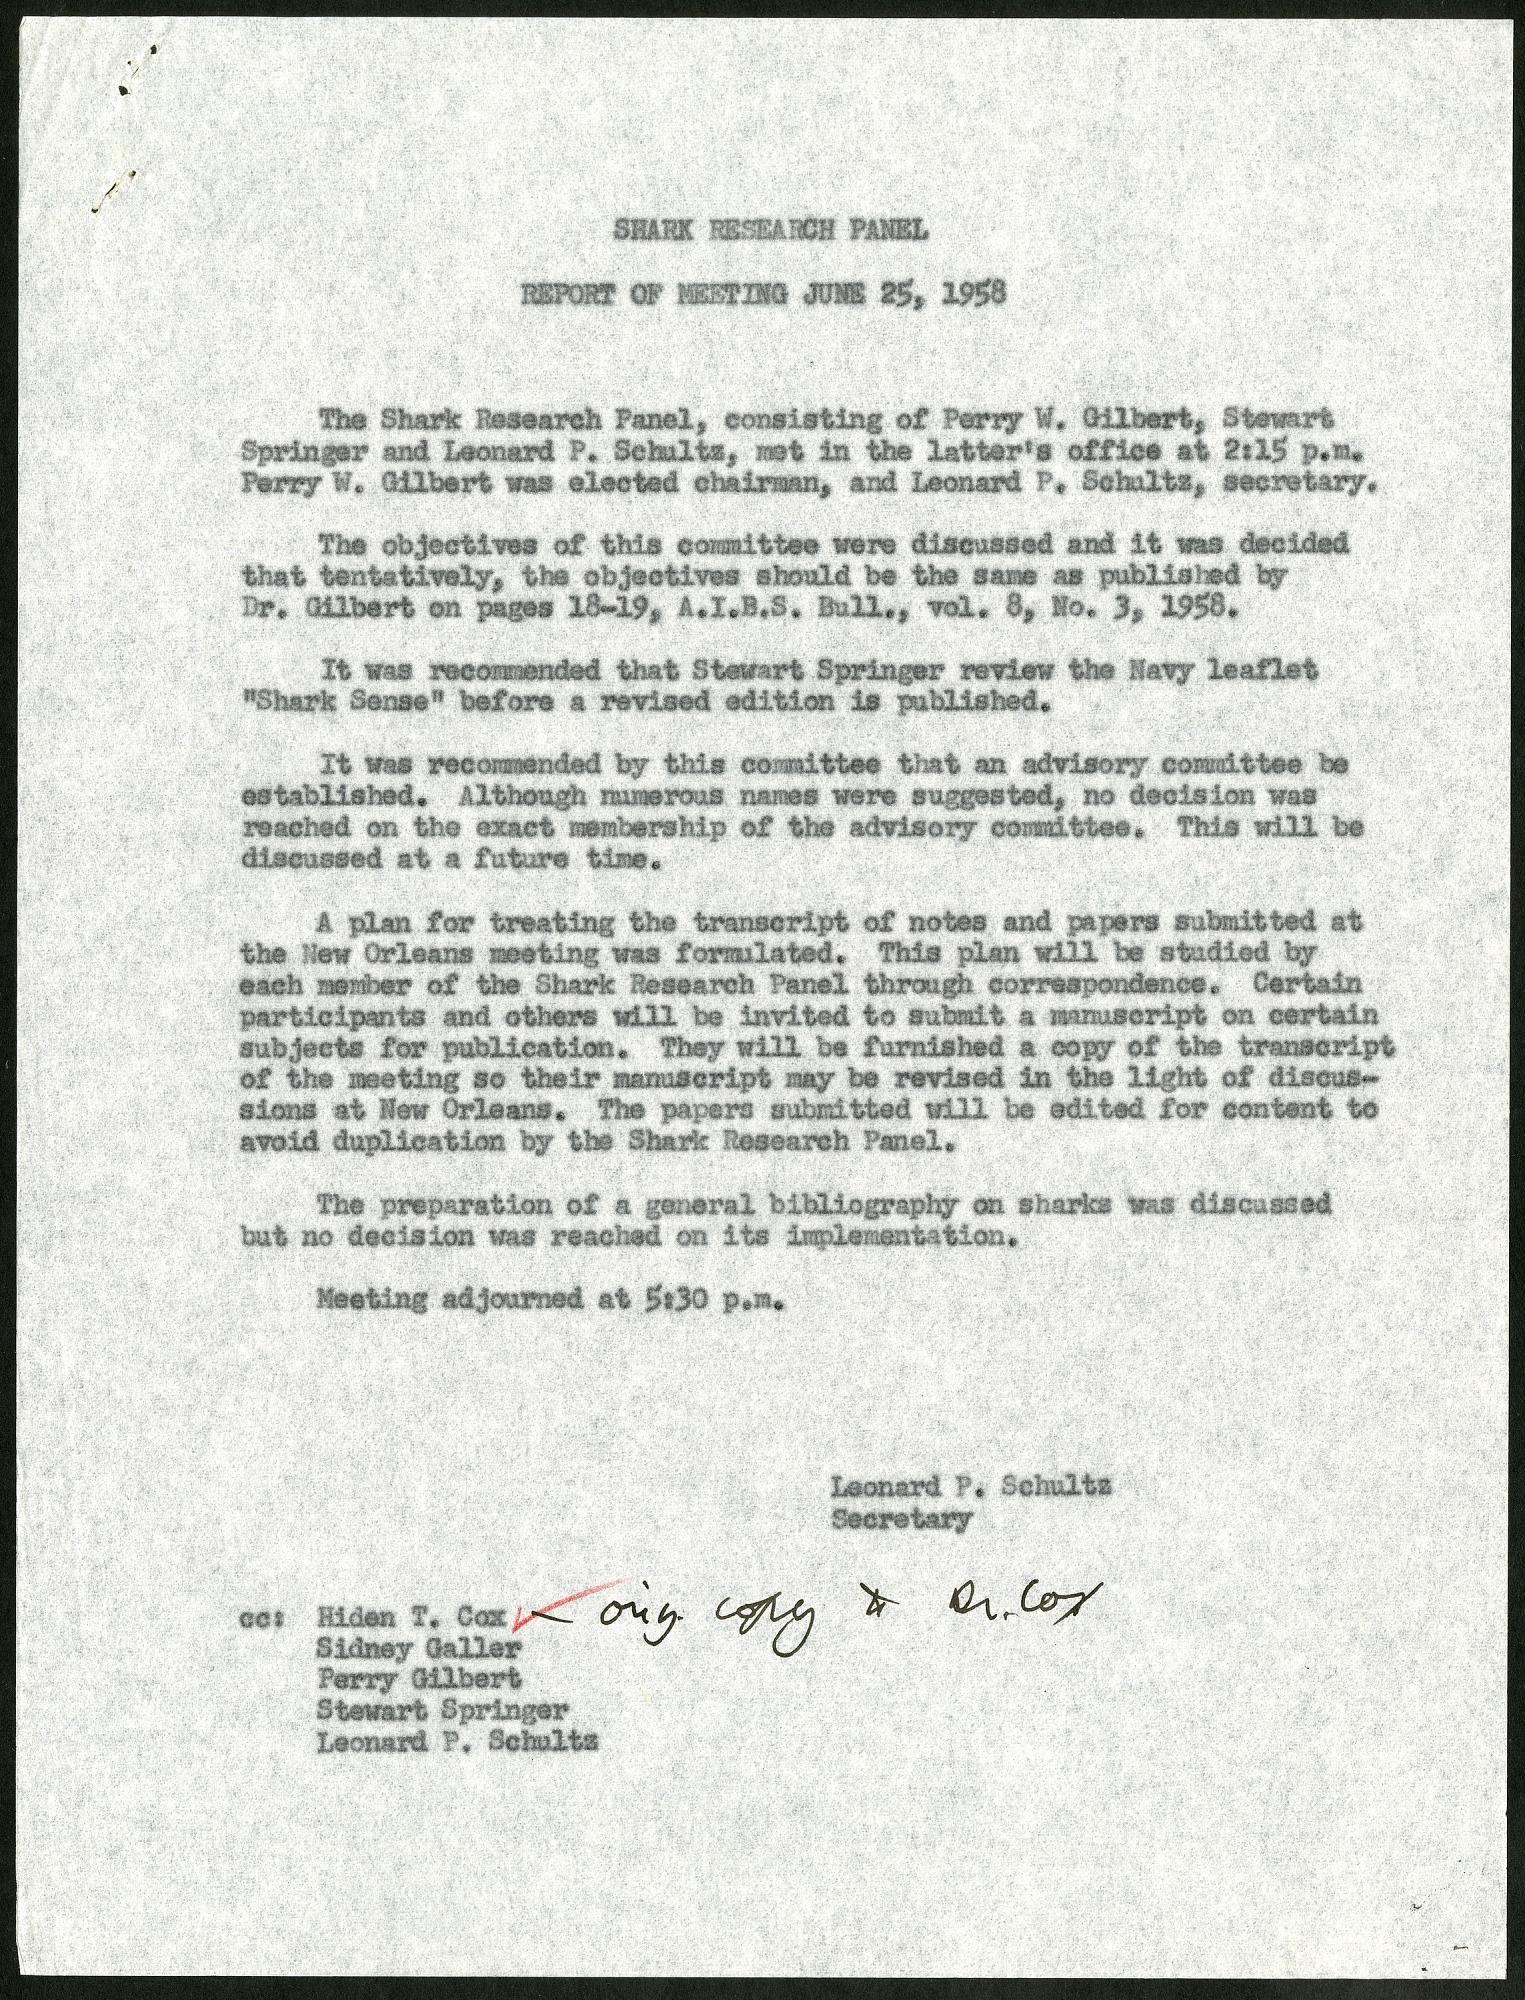 Shark Research Panel Report of Meeting, June 25, 1958